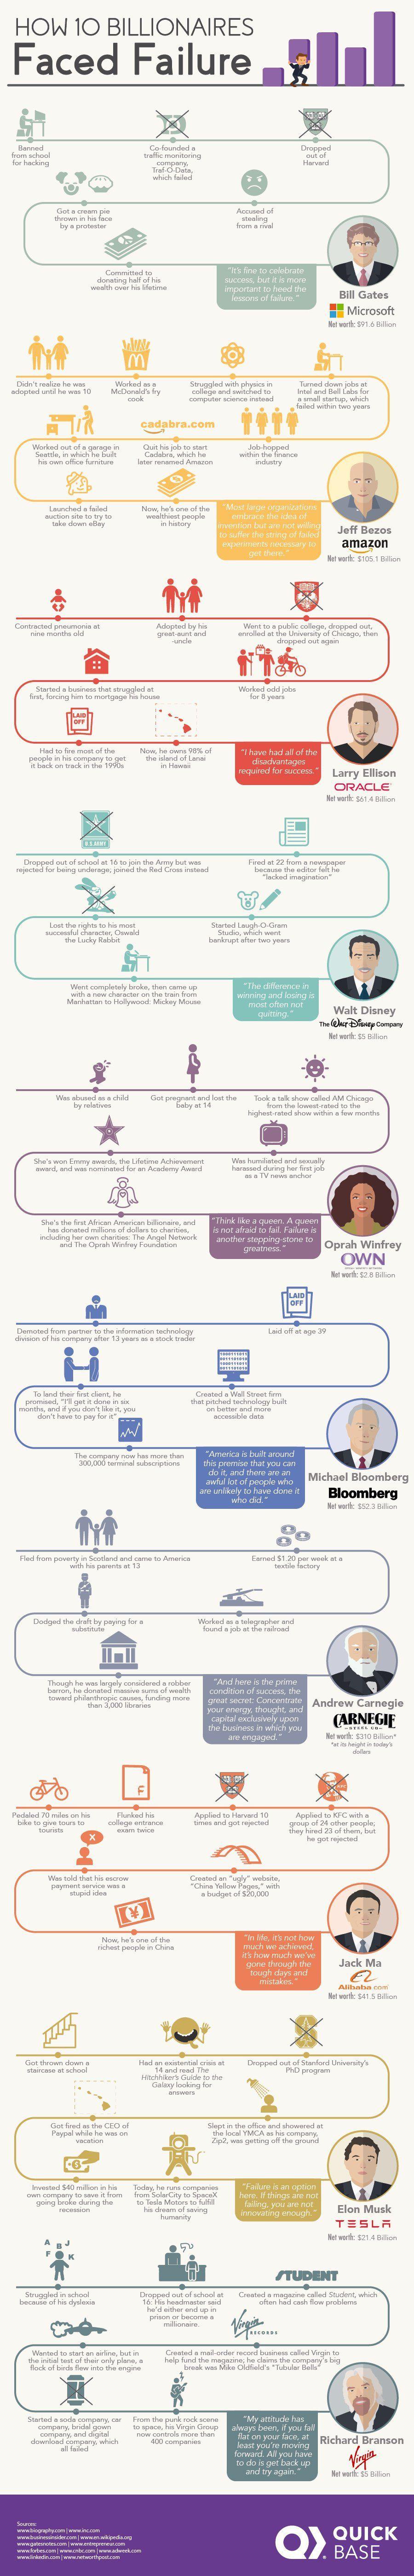 How 10 Billionaires Faced Failure Infographic Marketing Muses Infographic Billionaire Failure